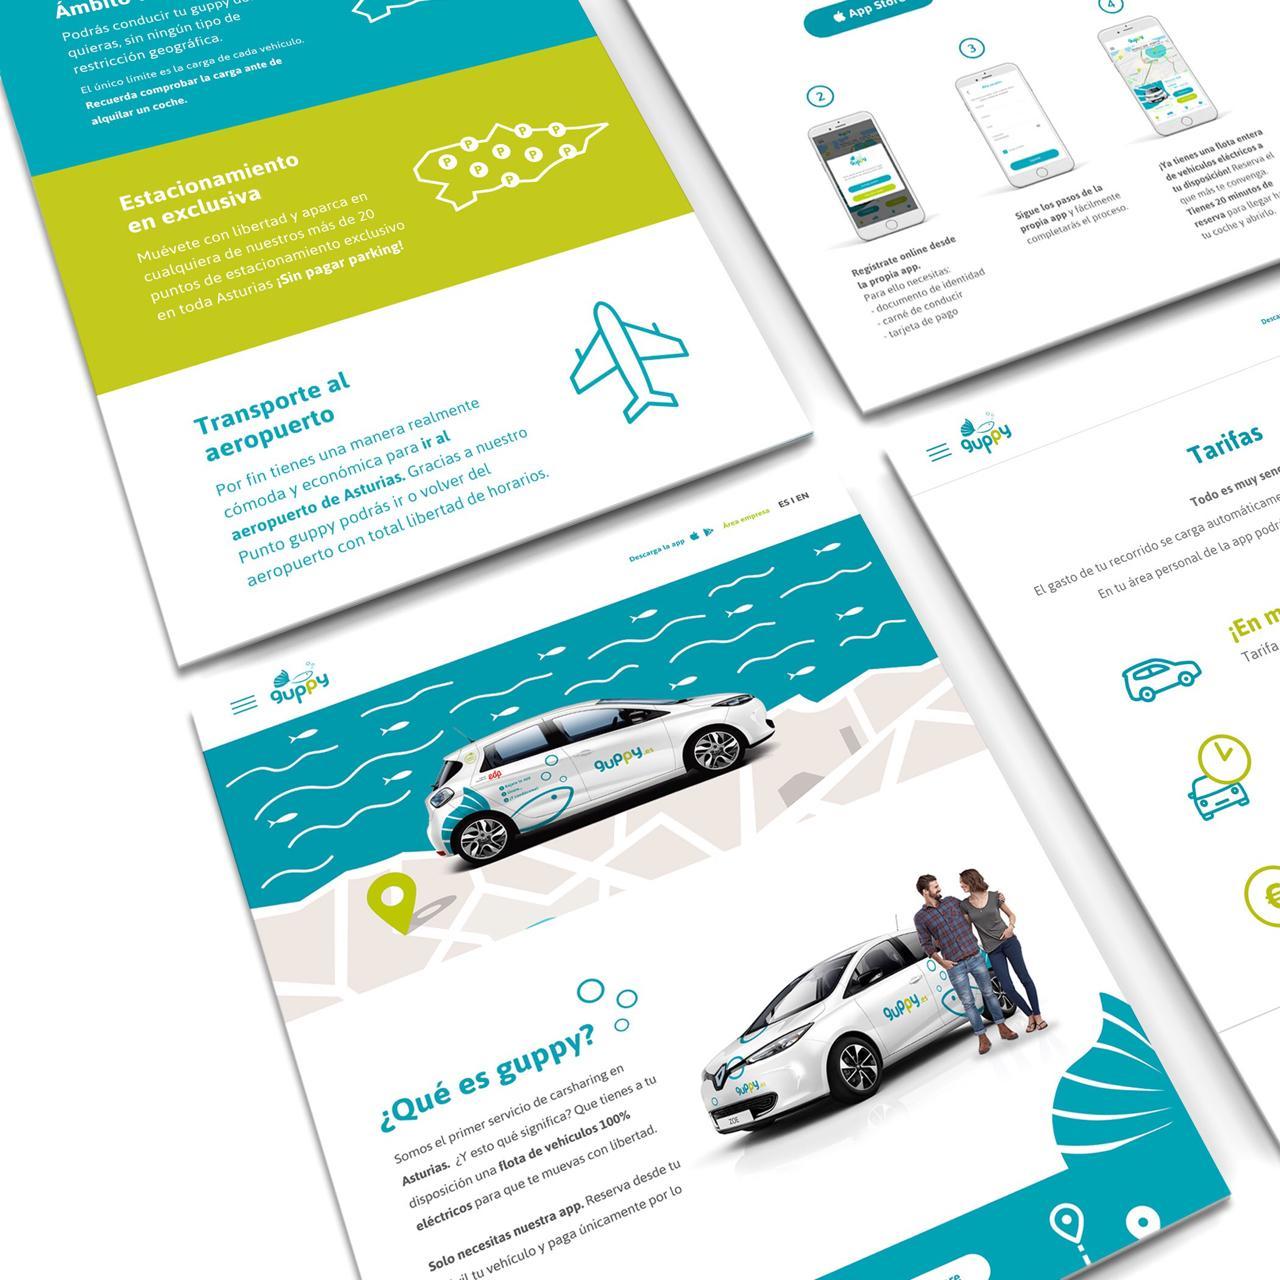 Guppy Carsharing diseño web